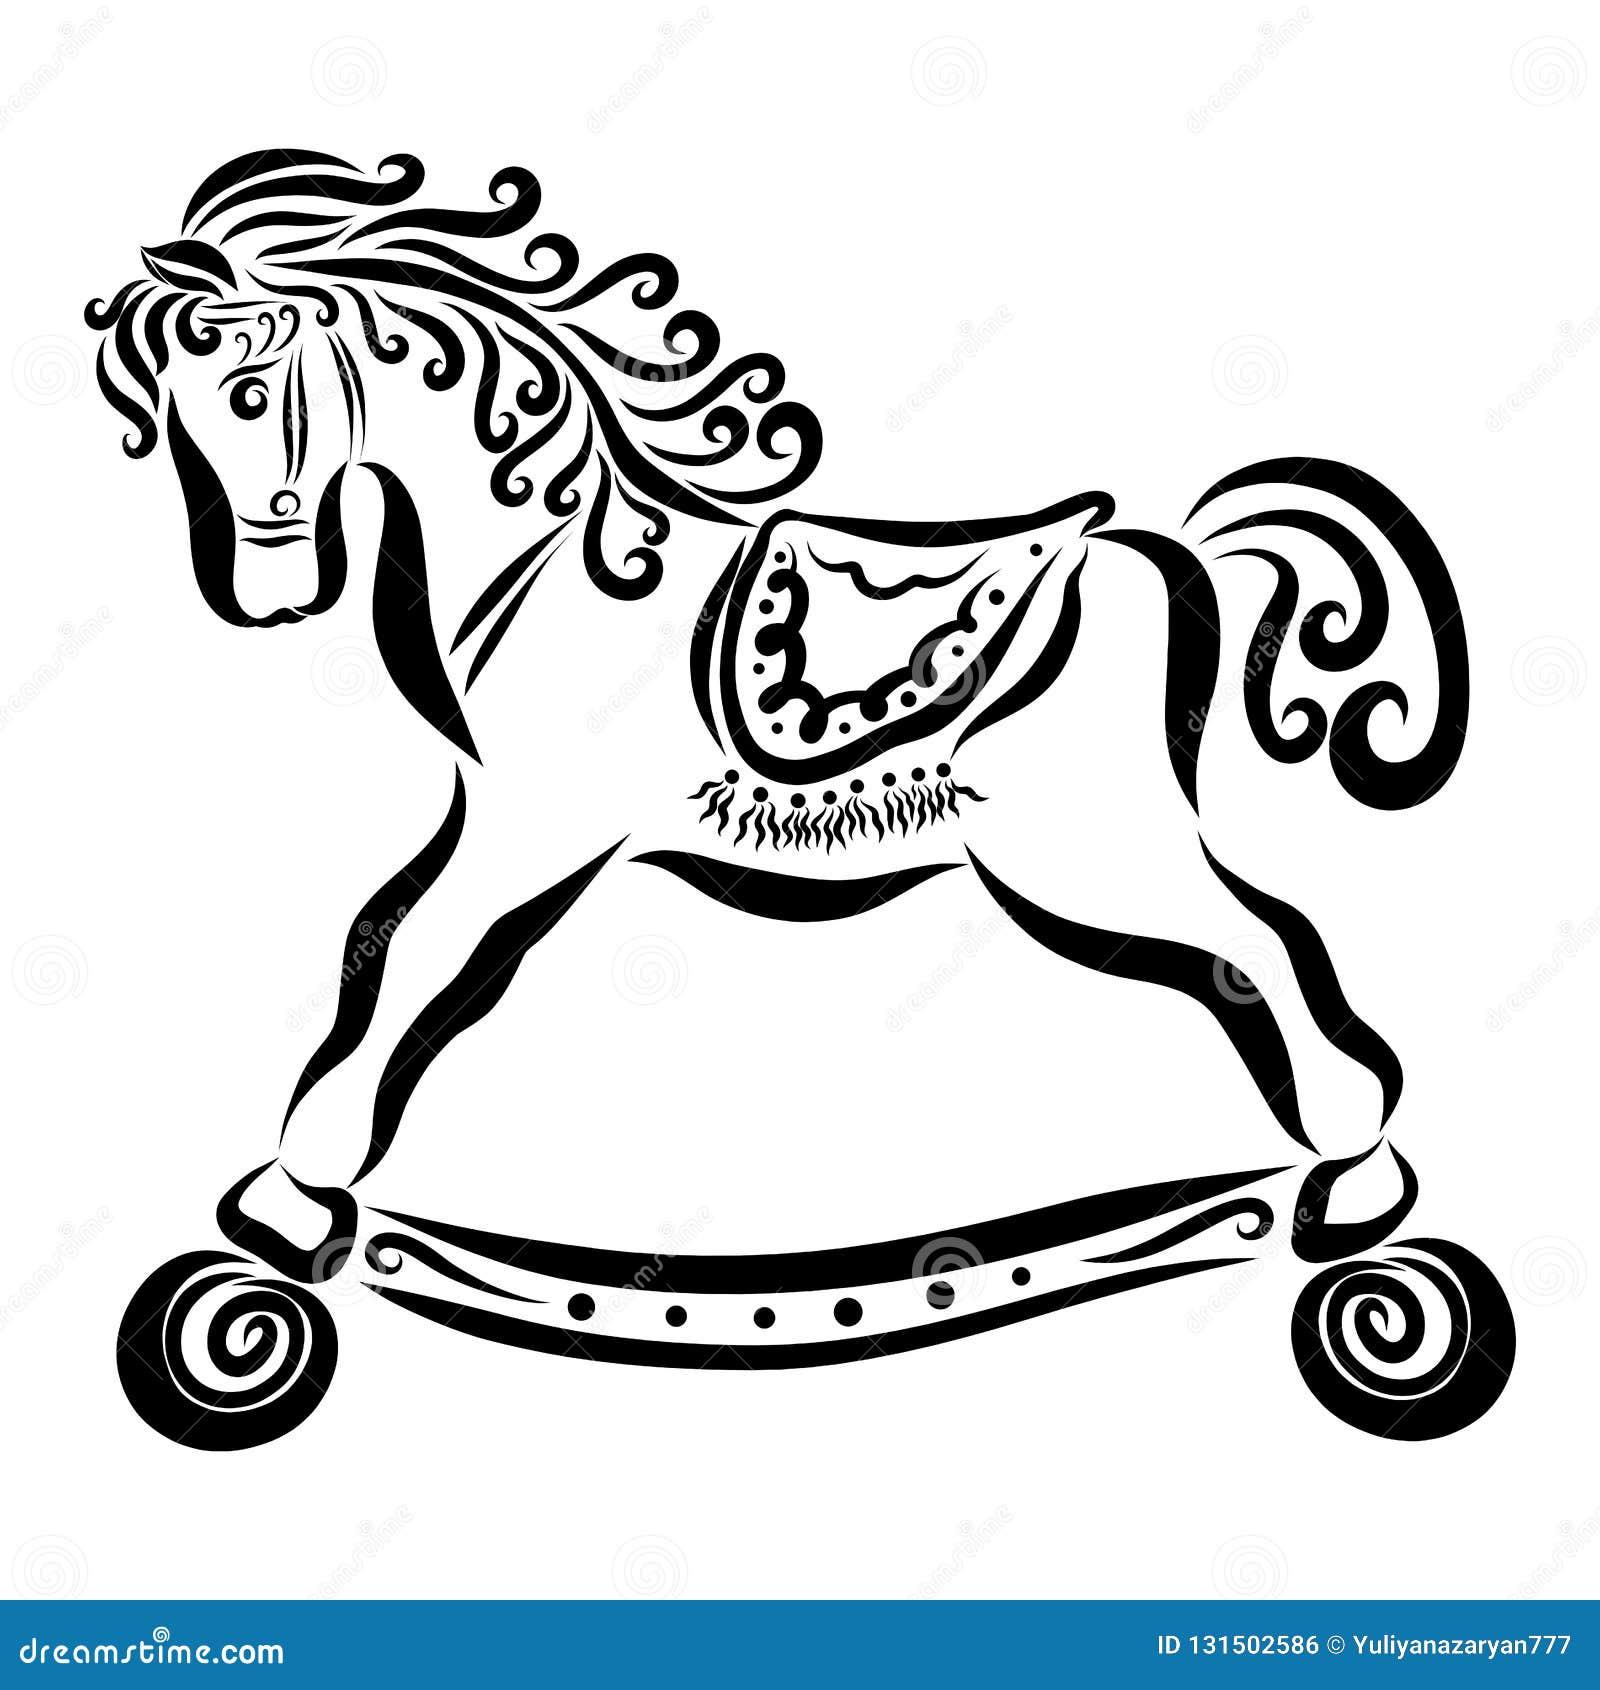 Wonderful baby horse on wheels with curly mane and saddle